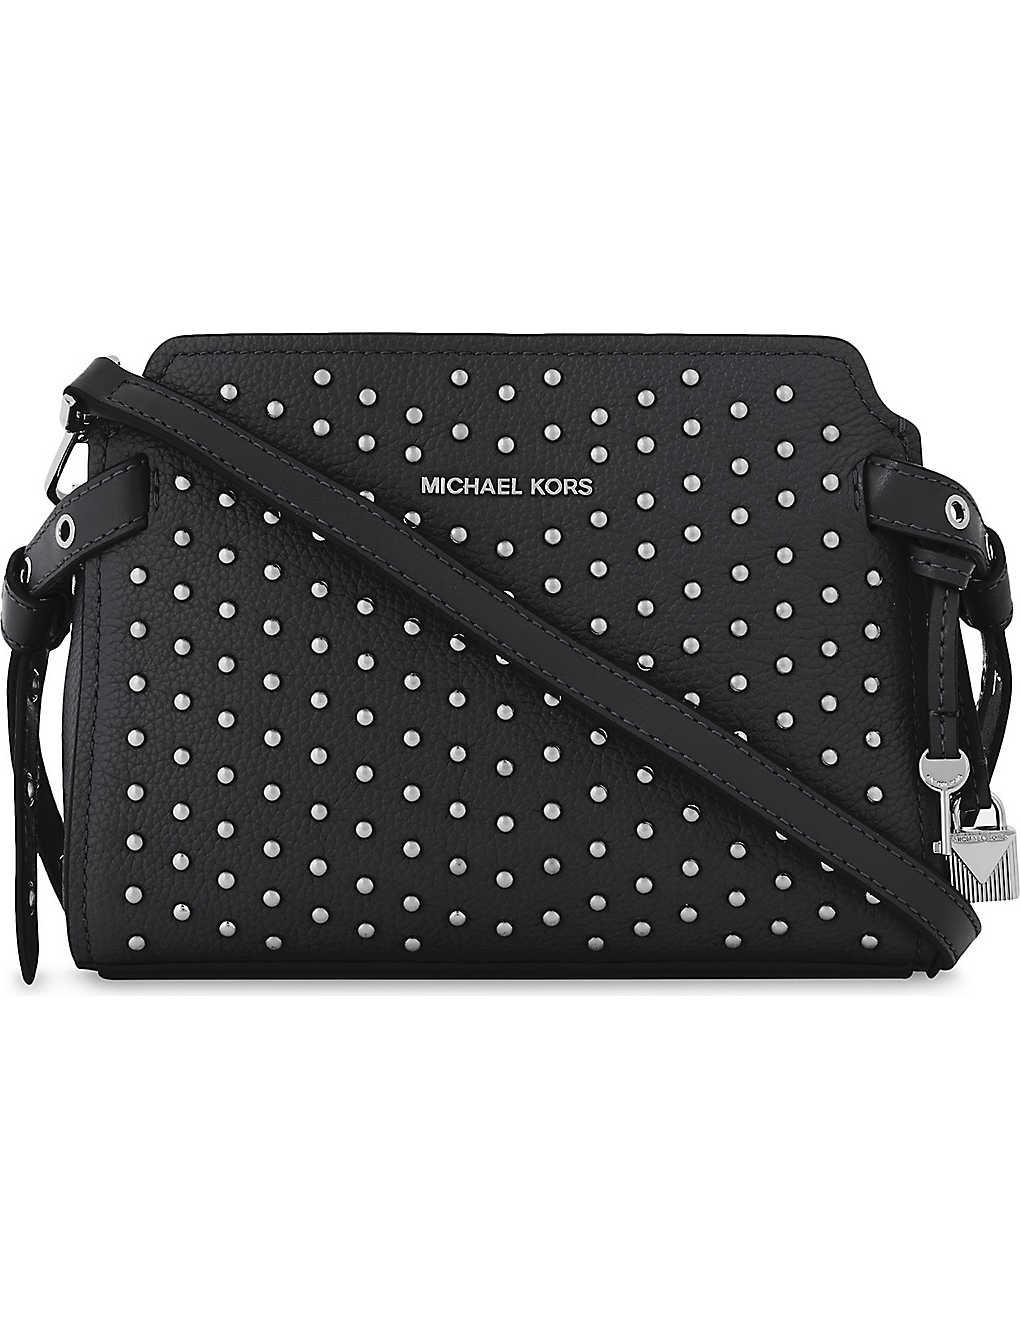 0e2a1173e963fe MICHAEL MICHAEL KORS - Bristol studded leather messenger bag ...